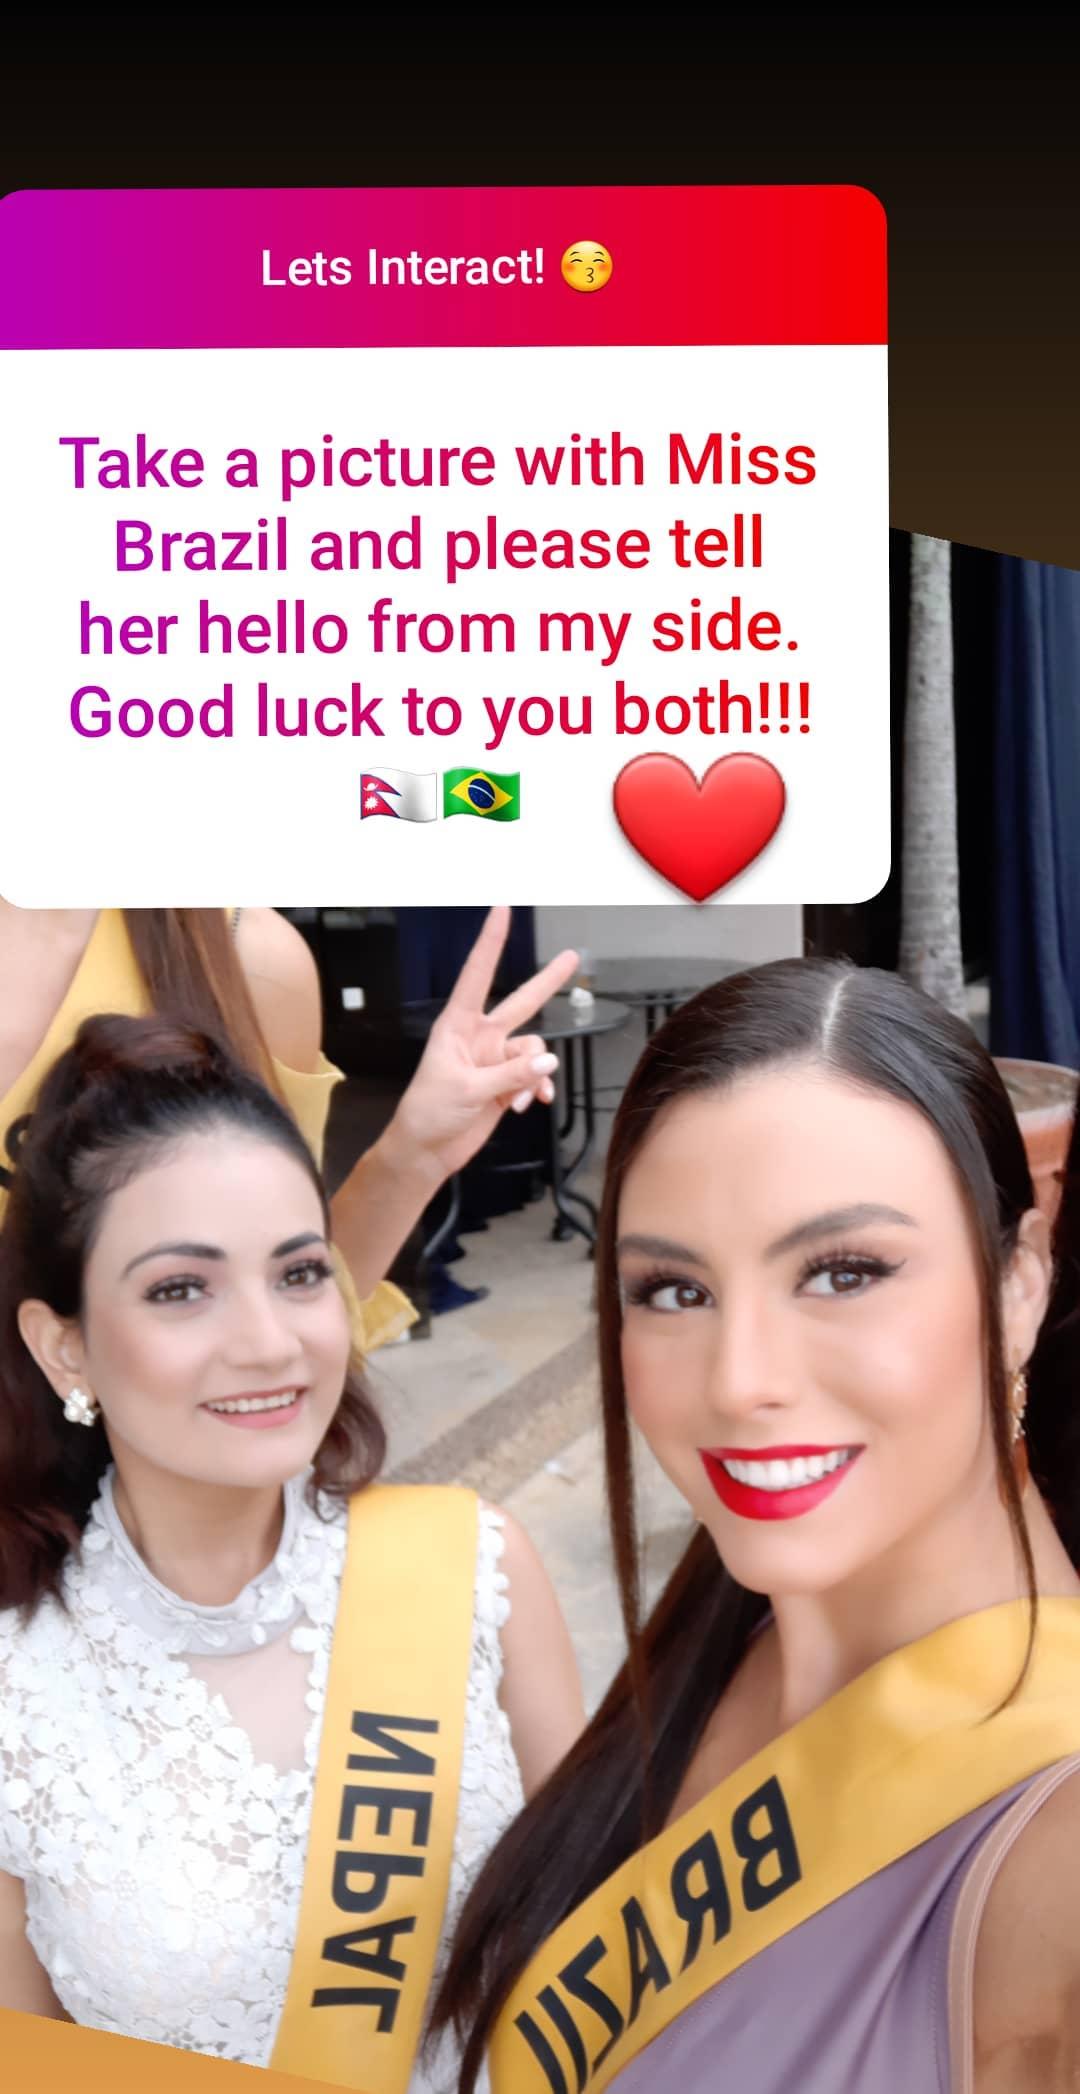 marjorie marcelle, top 5 de miss grand international 2019. - Página 31 Alex-425